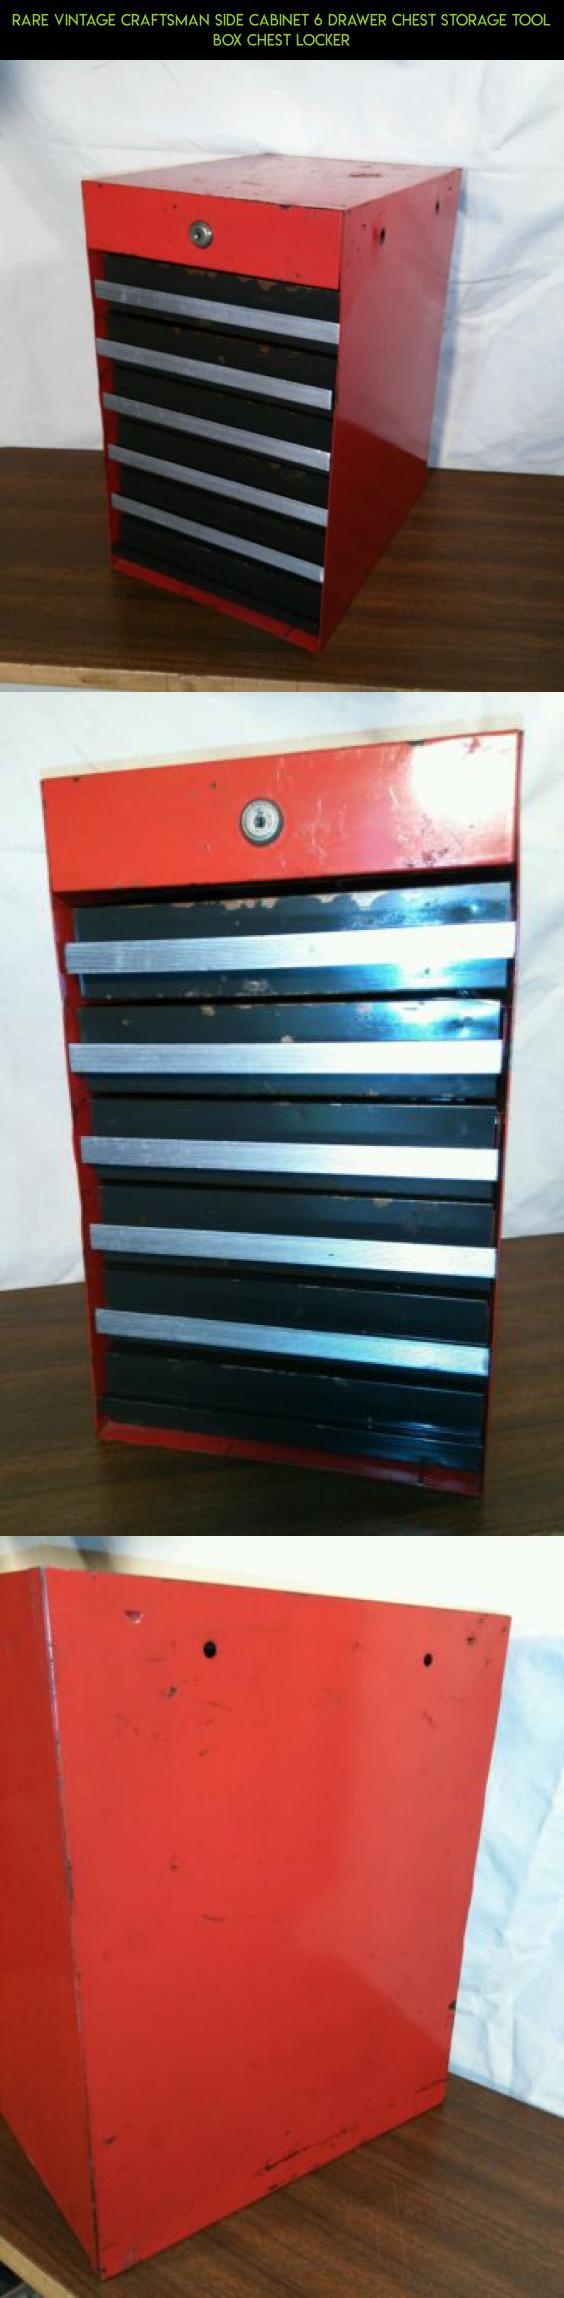 Rare Vintage Craftsman Side Cabinet 6 Drawer Chest Storage Tool Box Chest  Locker #drone #